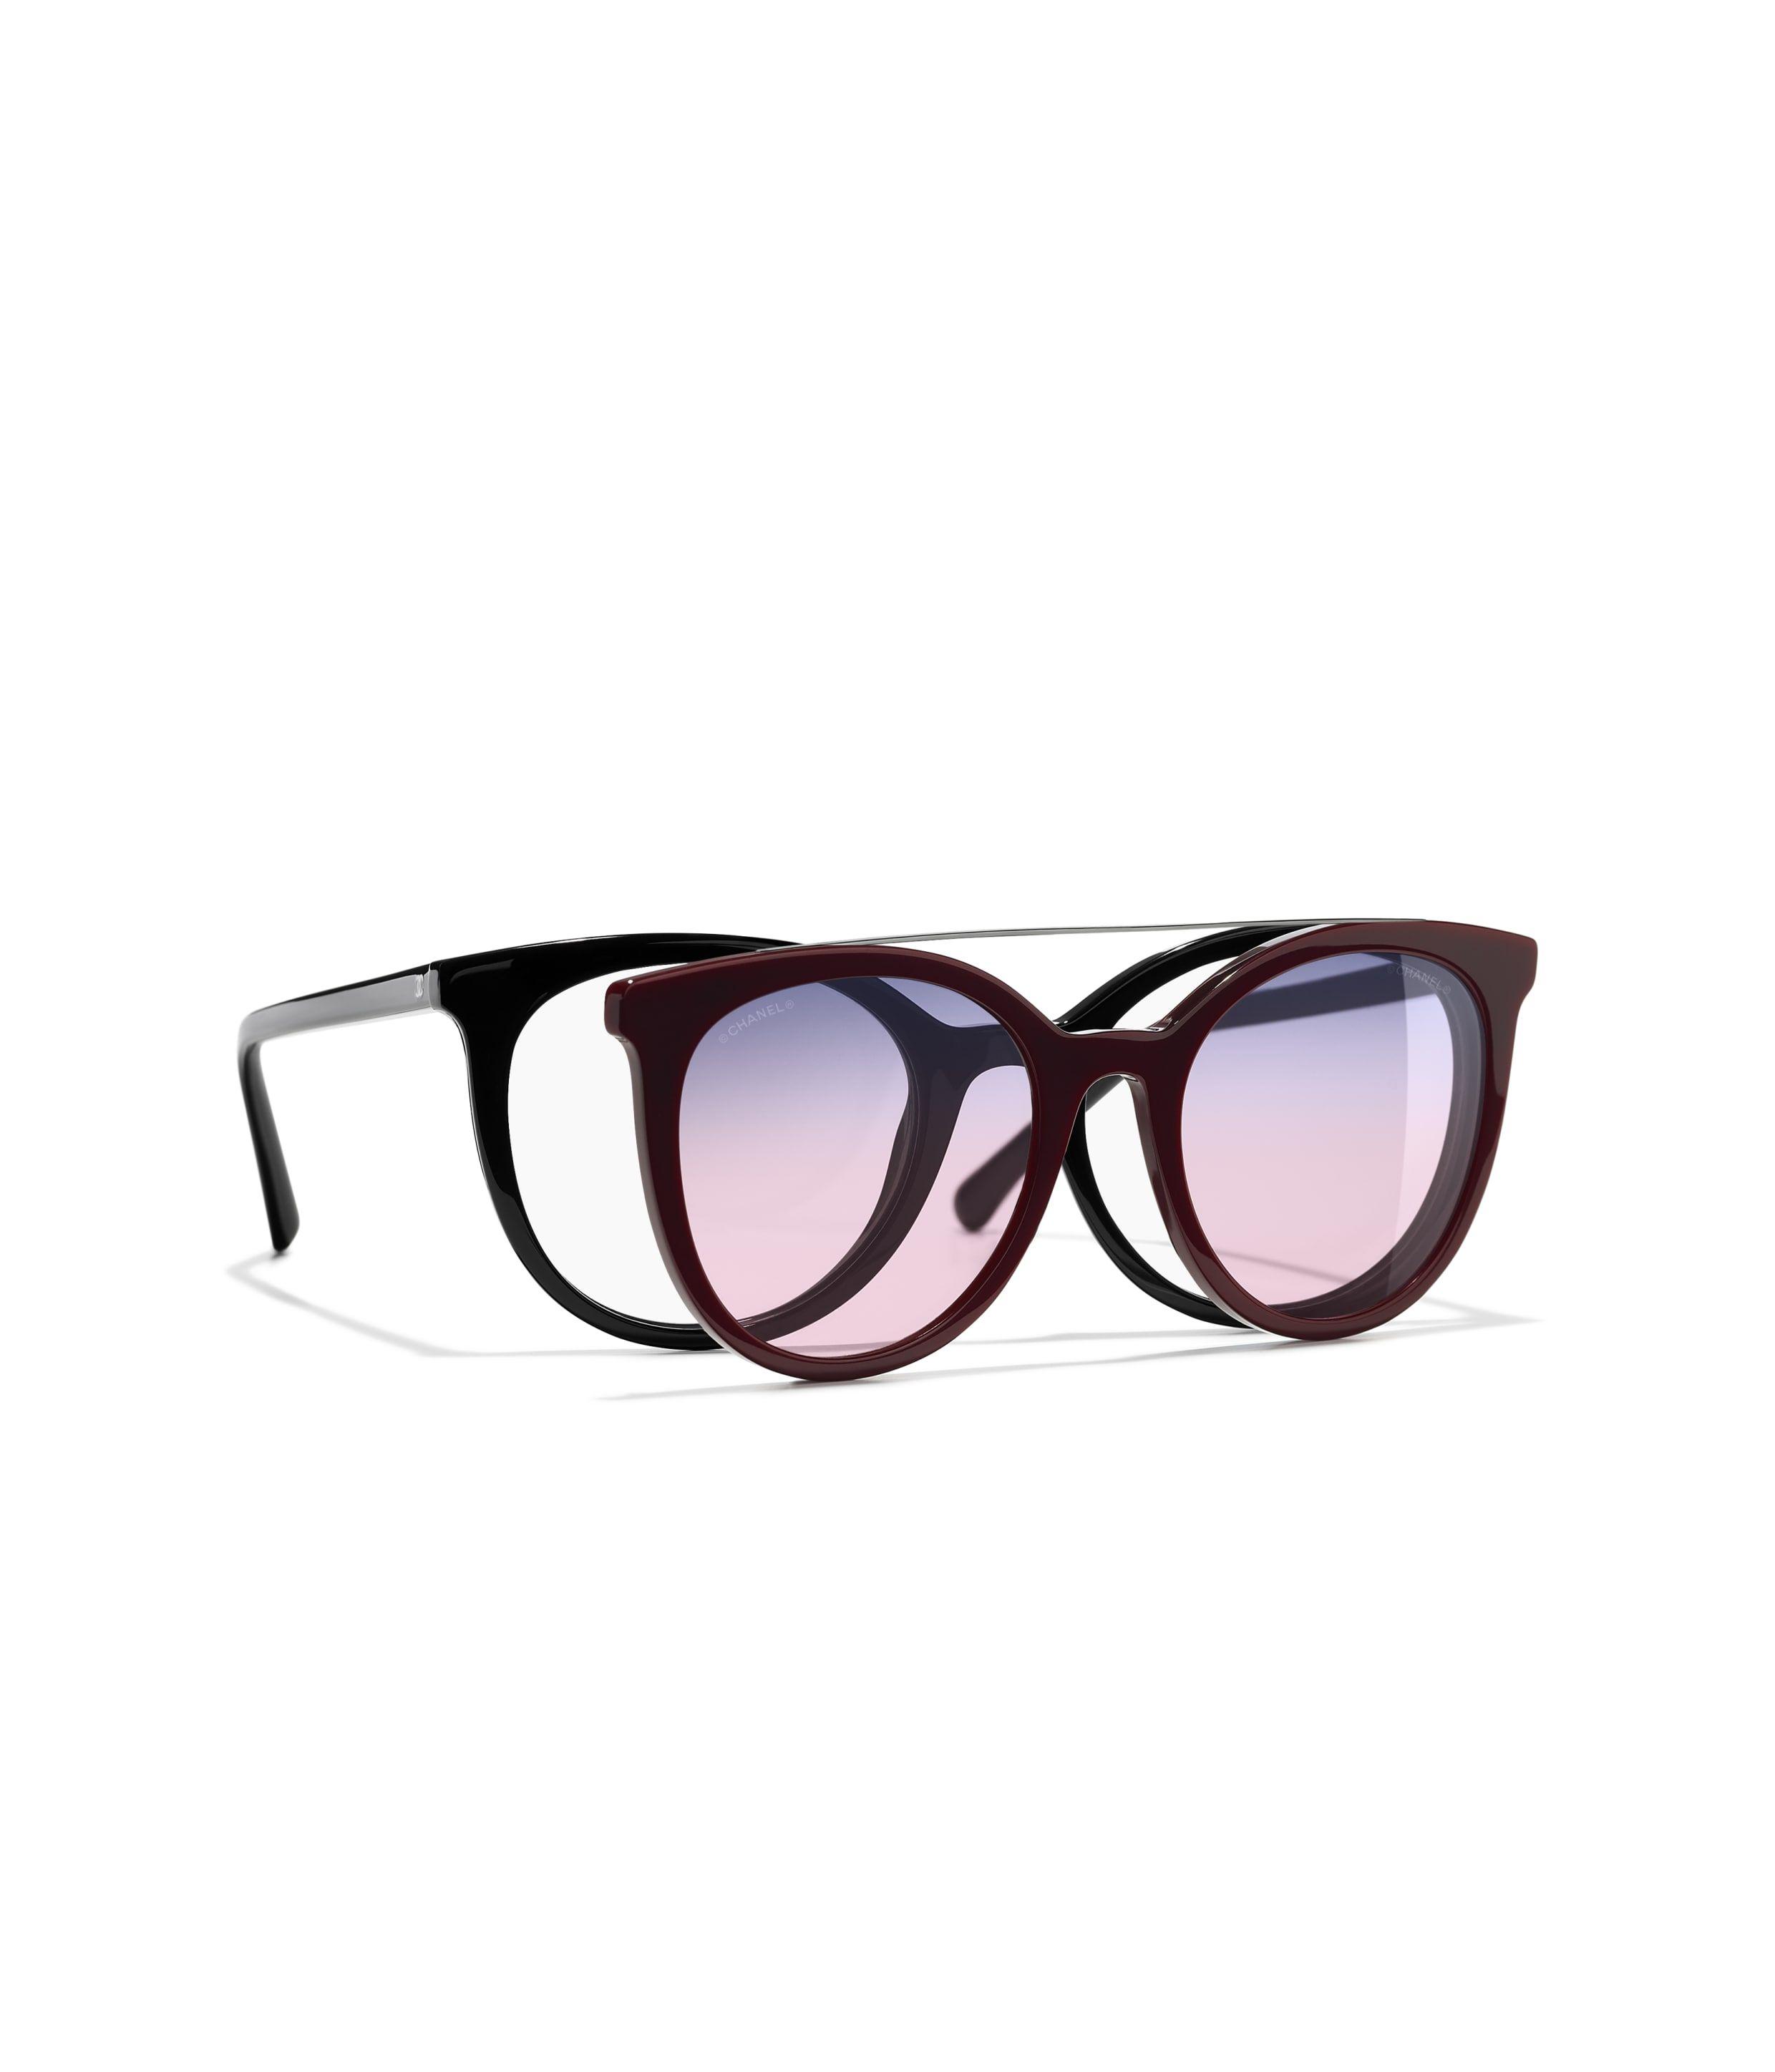 87481b23e0 Eyewear | CHANEL | CHANEL | Chanel sunglasses, Clip on sunglasses ...